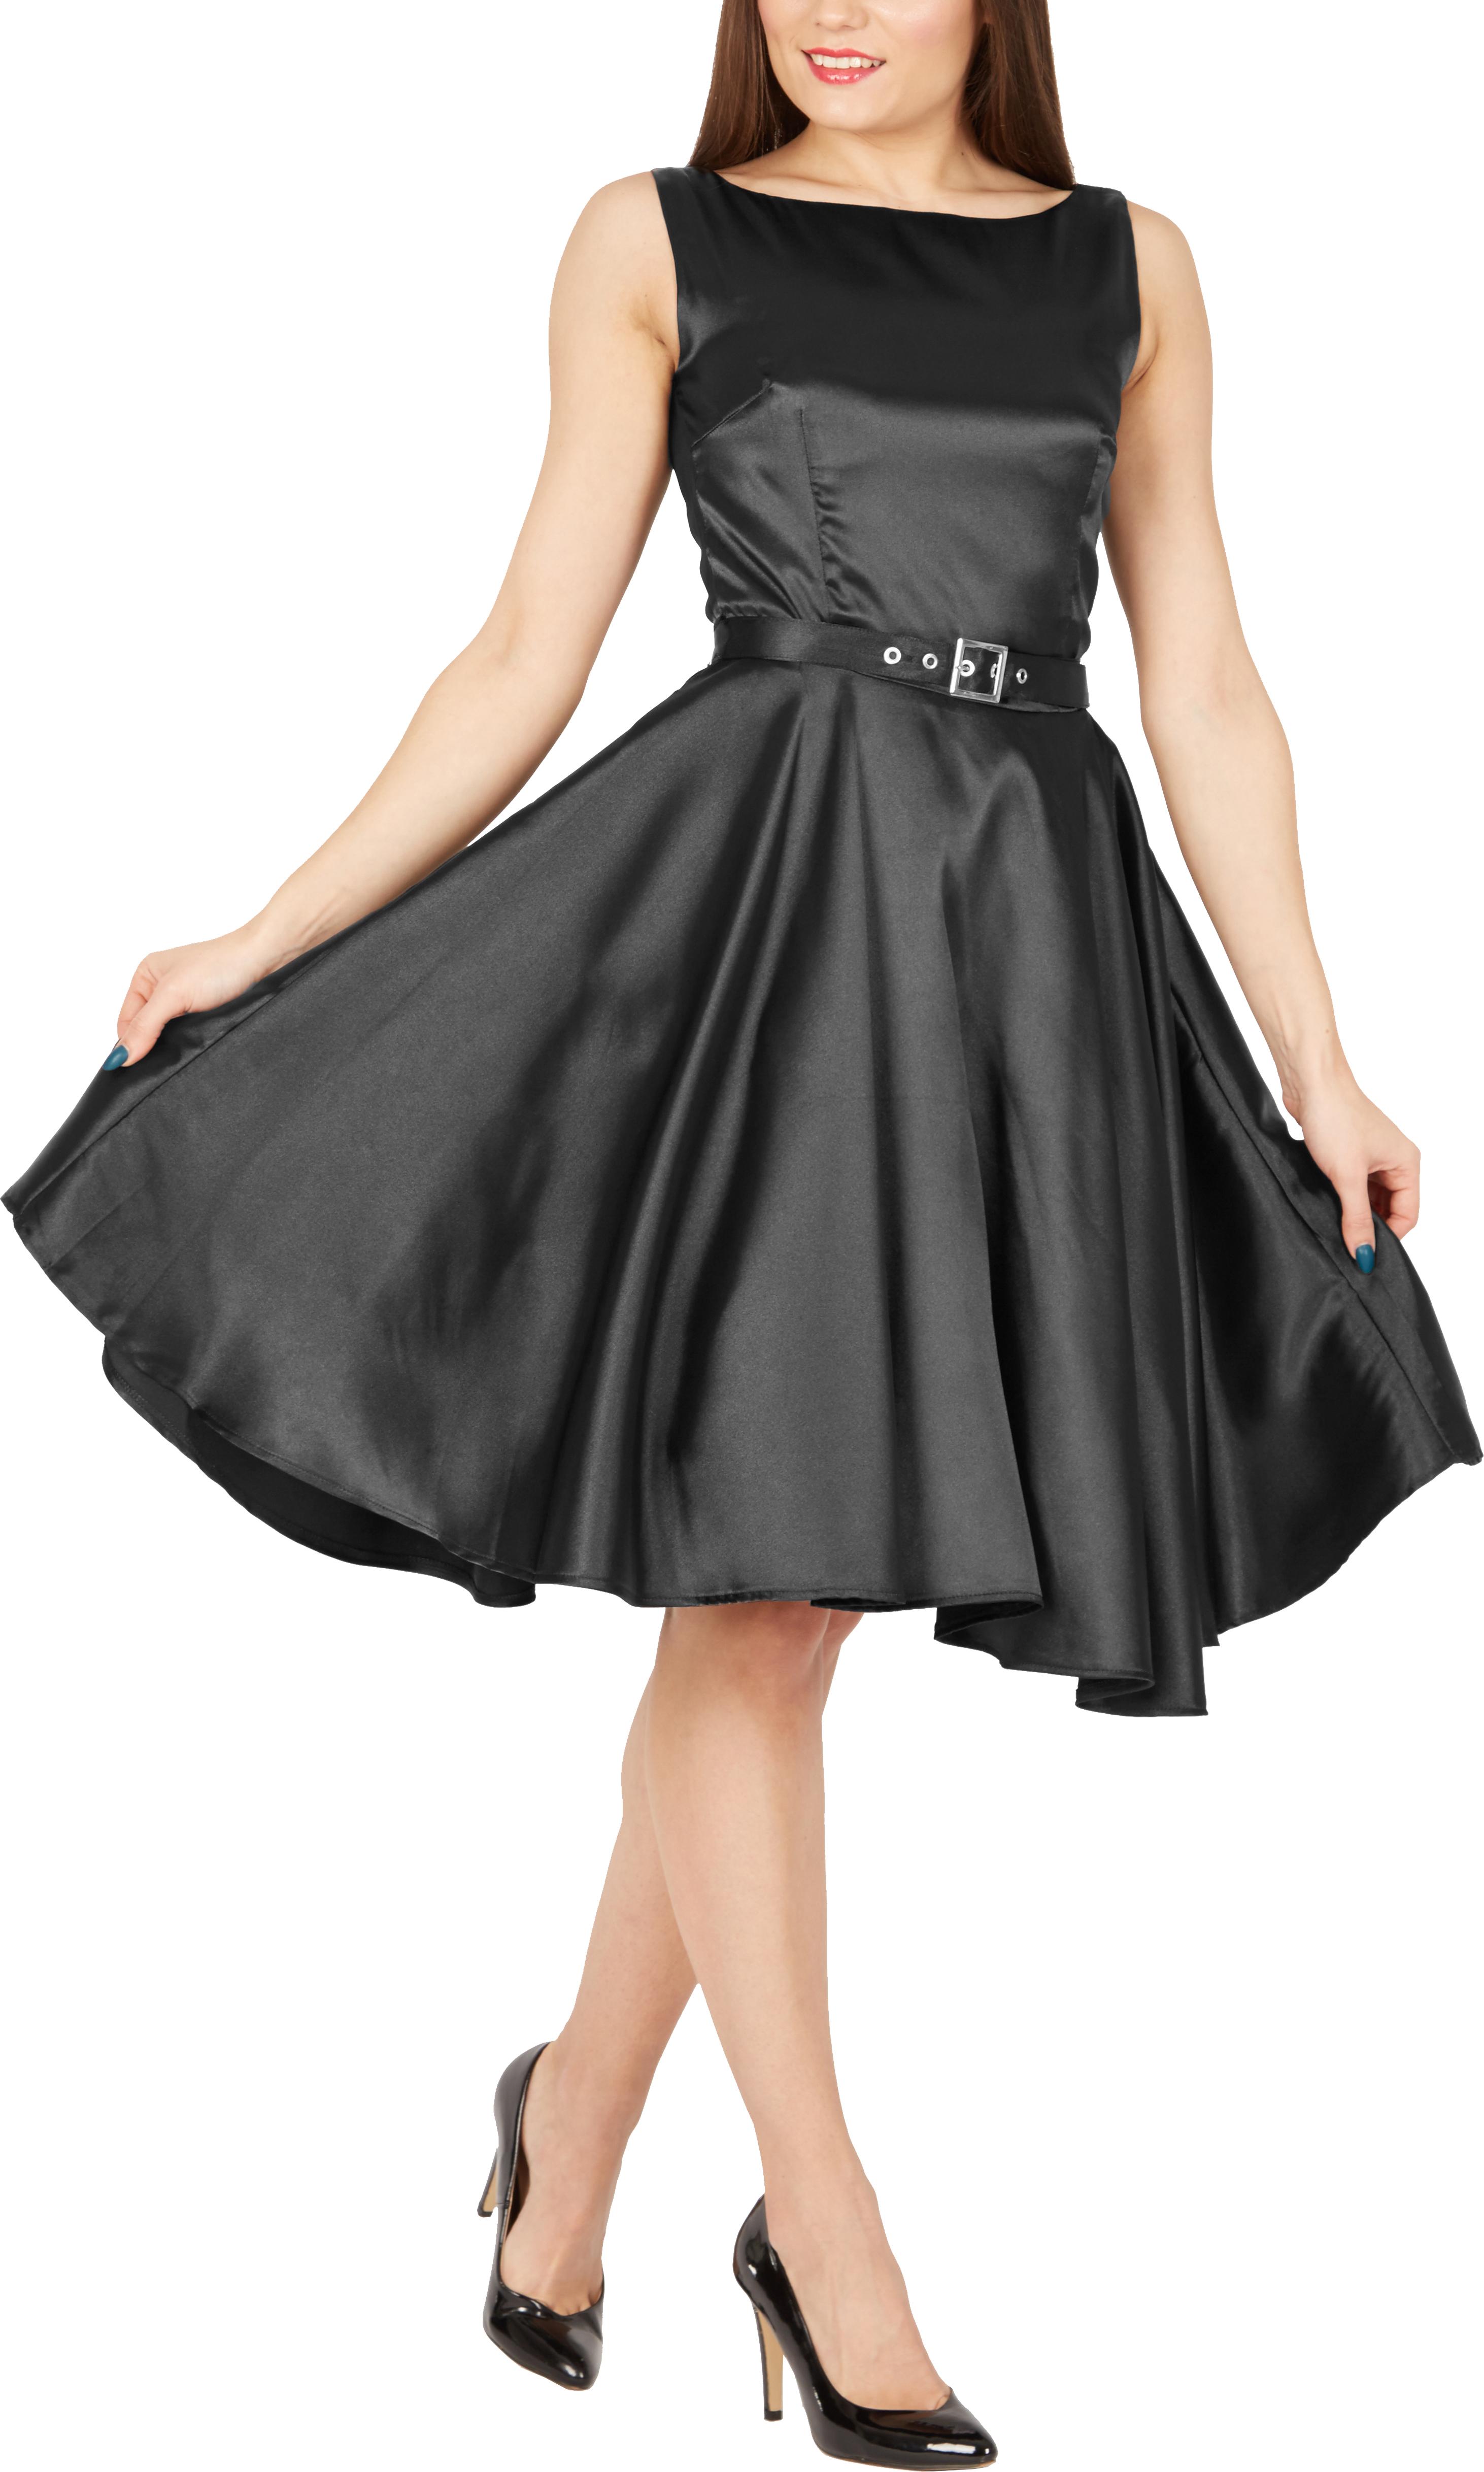 BlackButterfly-Audrey-Vintage-Satin-Clarity-Vintage-50-039-s-Rockabilly-Swing-Dress thumbnail 3